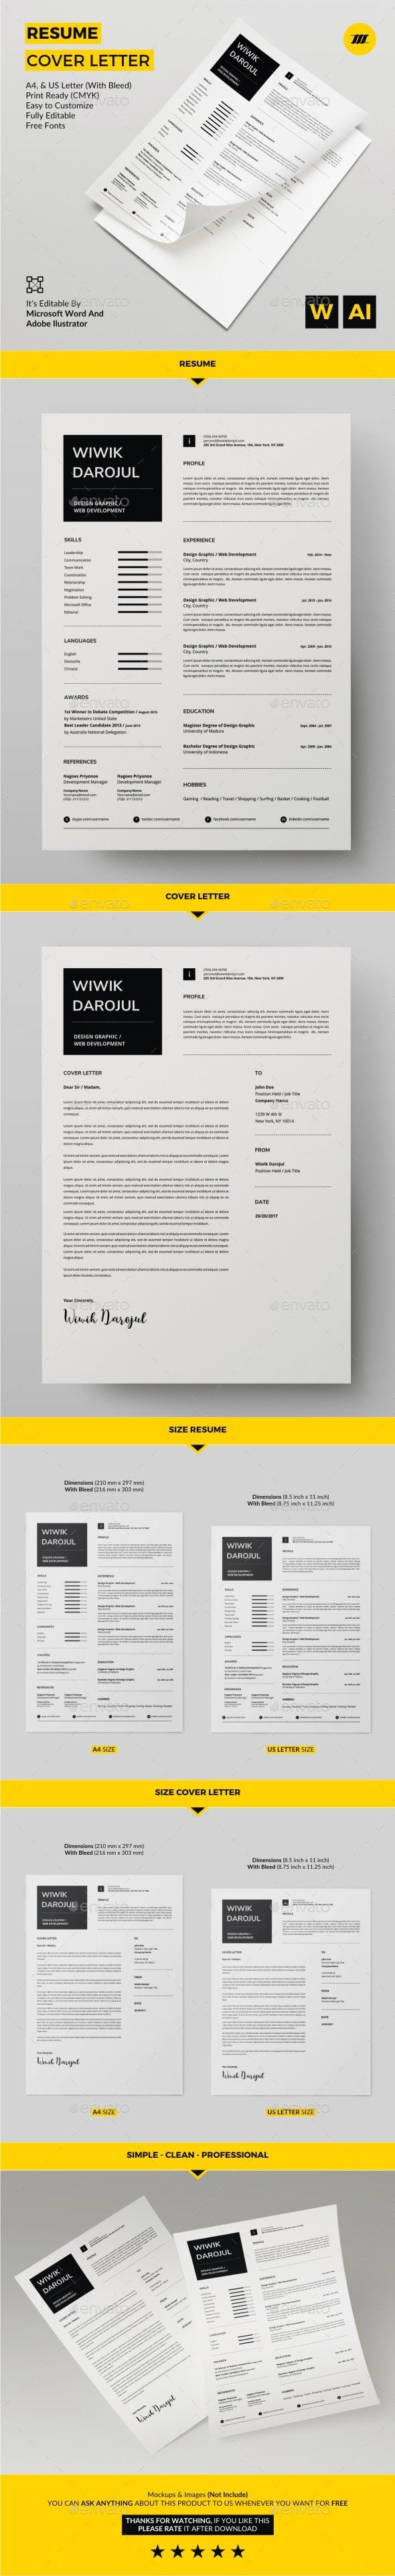 Profile On A Resume Excel  Best Resume Templates Images On Pinterest Babysitter Resume Skills Pdf with Non Chronological Resume Word Resume Resume Service Orange County Pdf